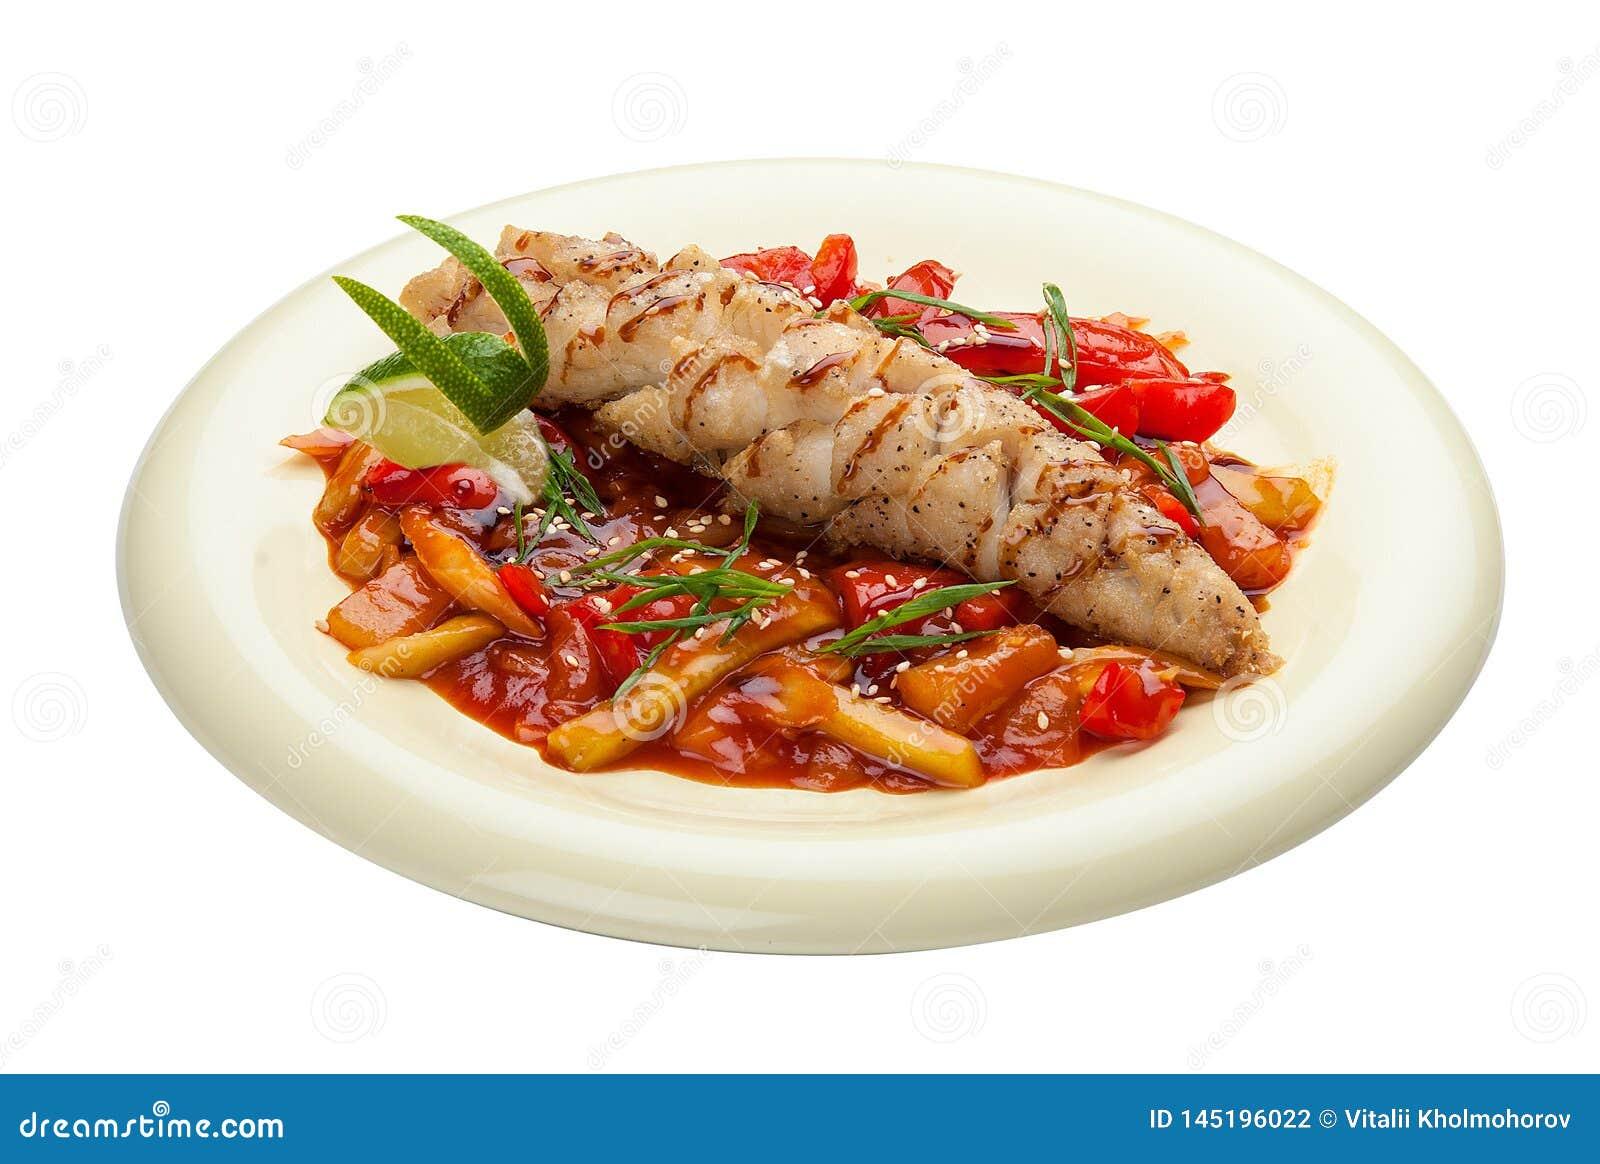 Lucioperca con le verdure in salsa agrodolce Cucina asiatica